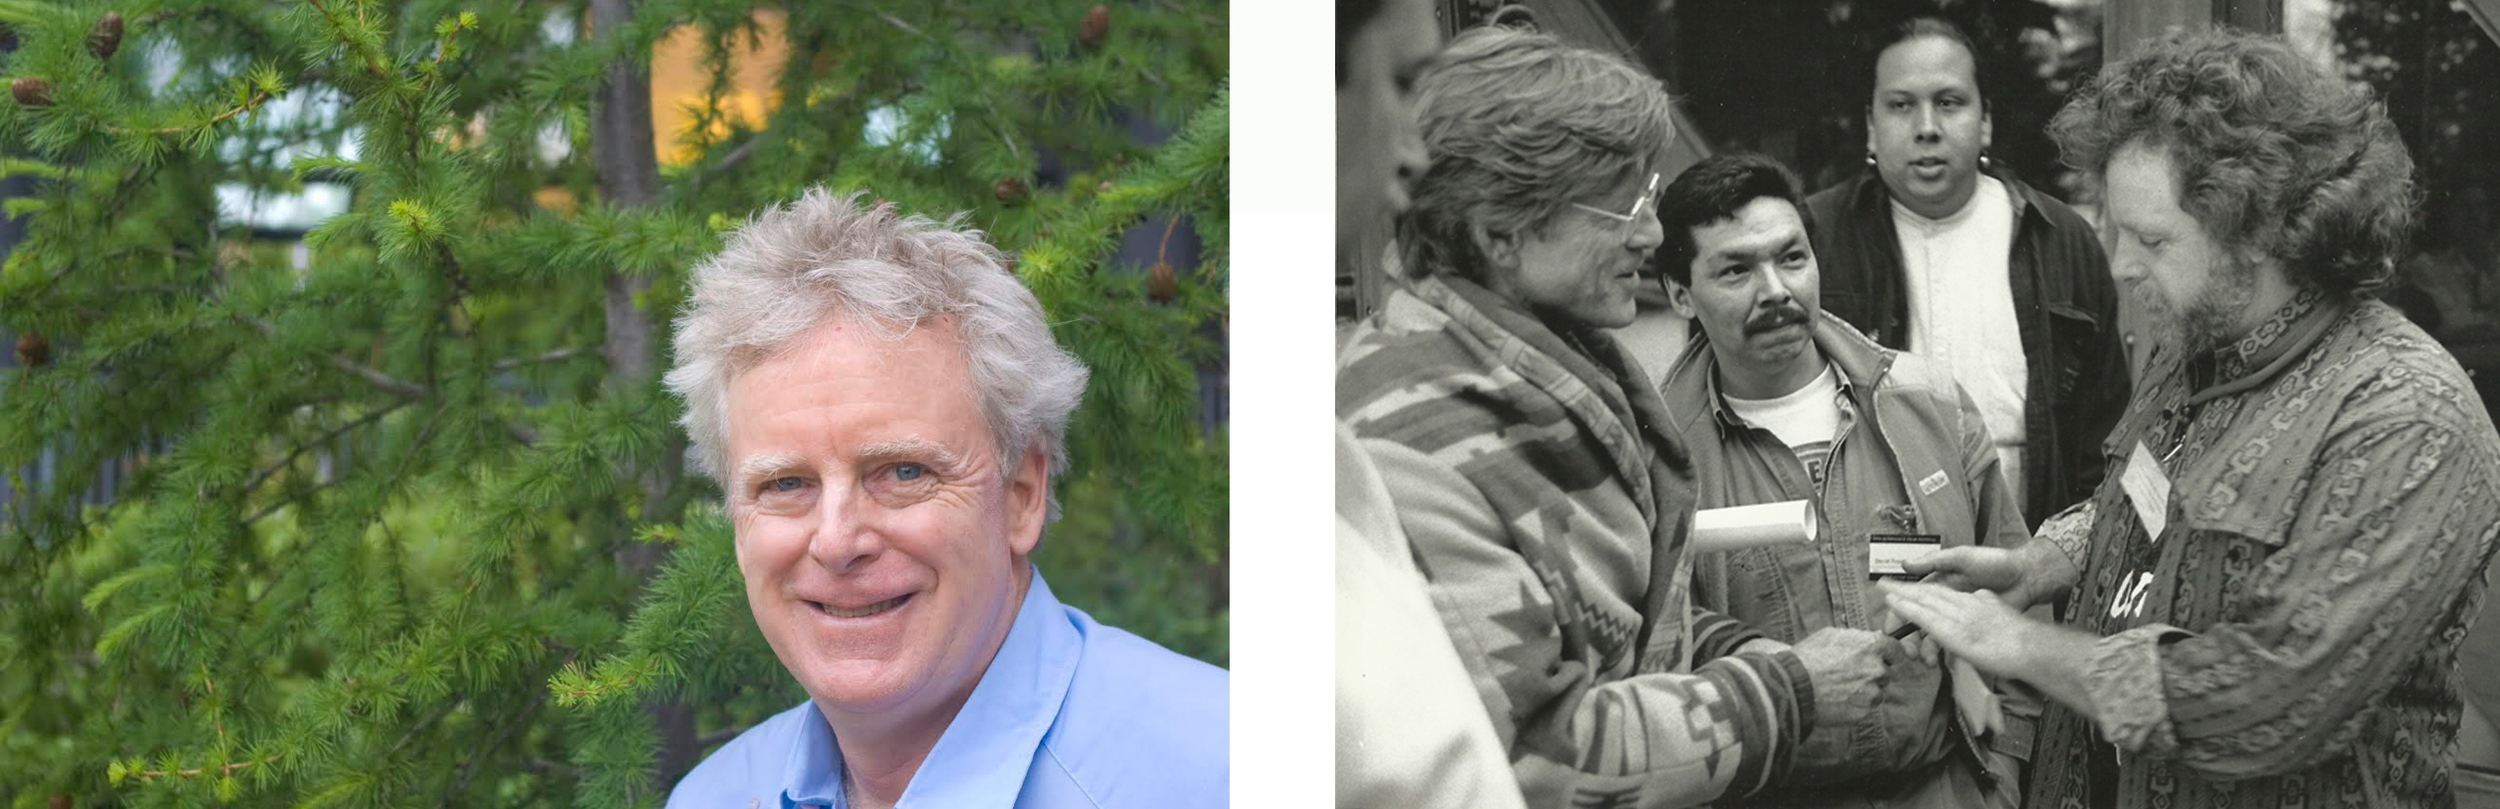 James Cullingham (PhD York University, Toronto), 2014                       Robert Redford, David Poisey and James Cullingham                                                                  Sundance Film Festival, 1994